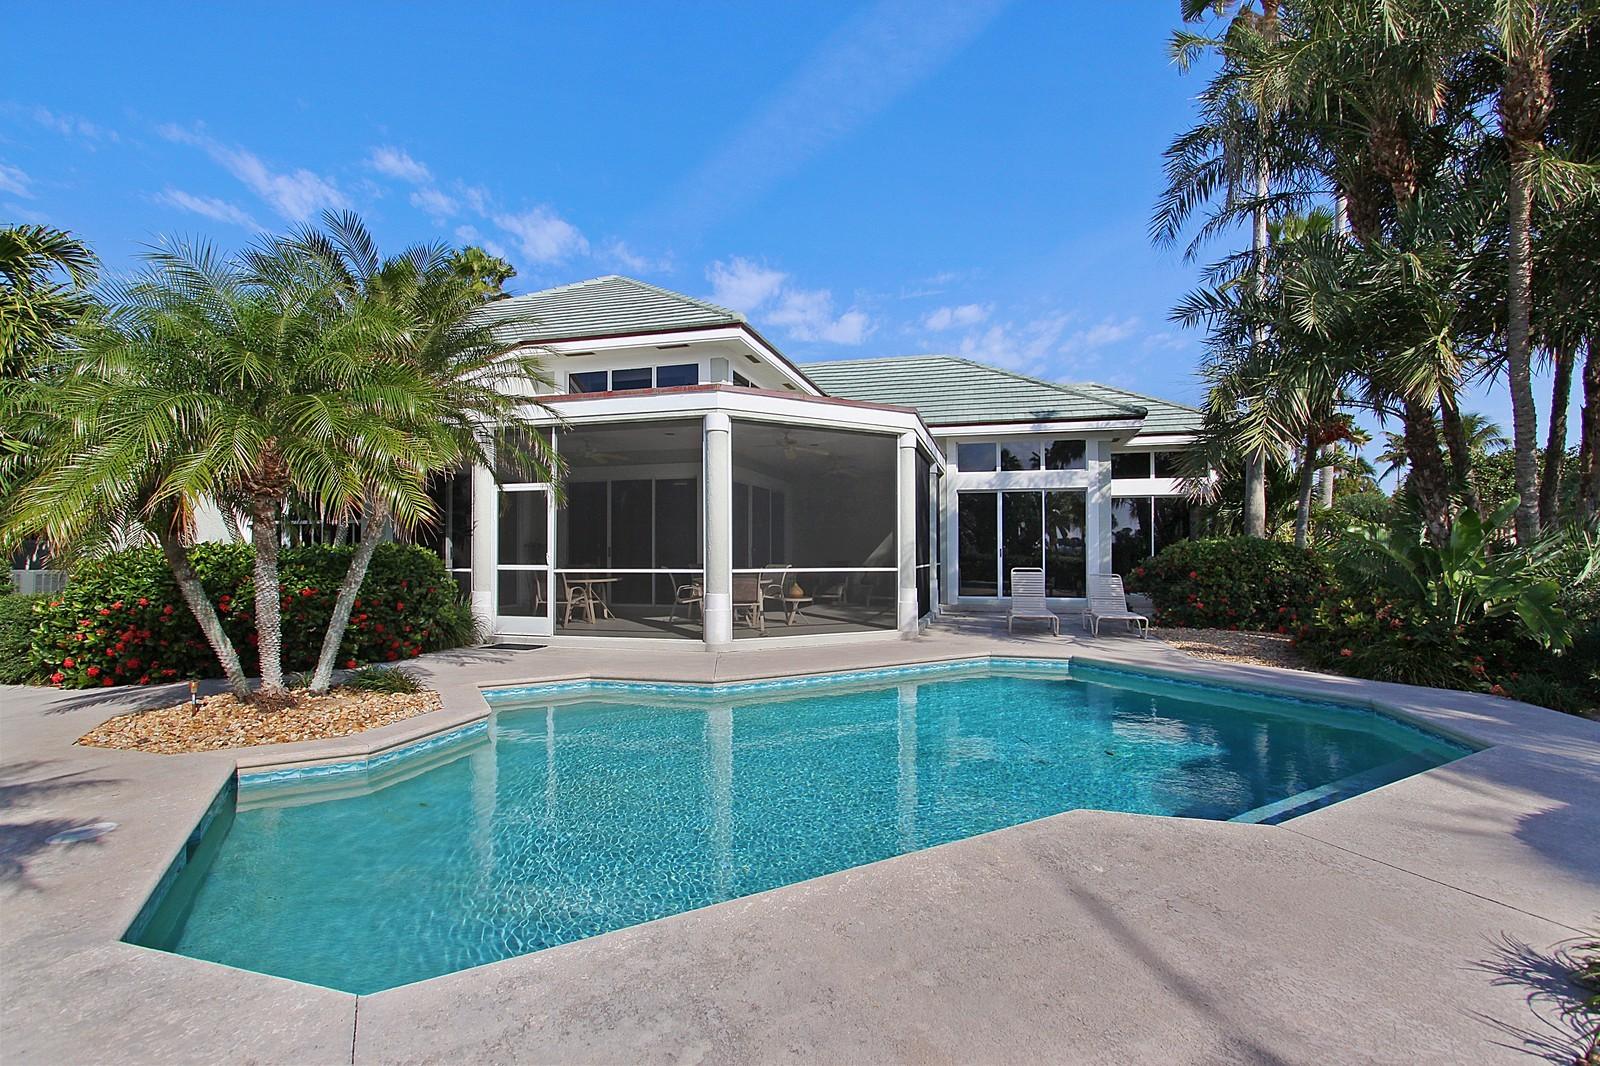 Real Estate Photography - 6930 SE Lakeview Ter, Stuart, FL, 34996 - Rear View